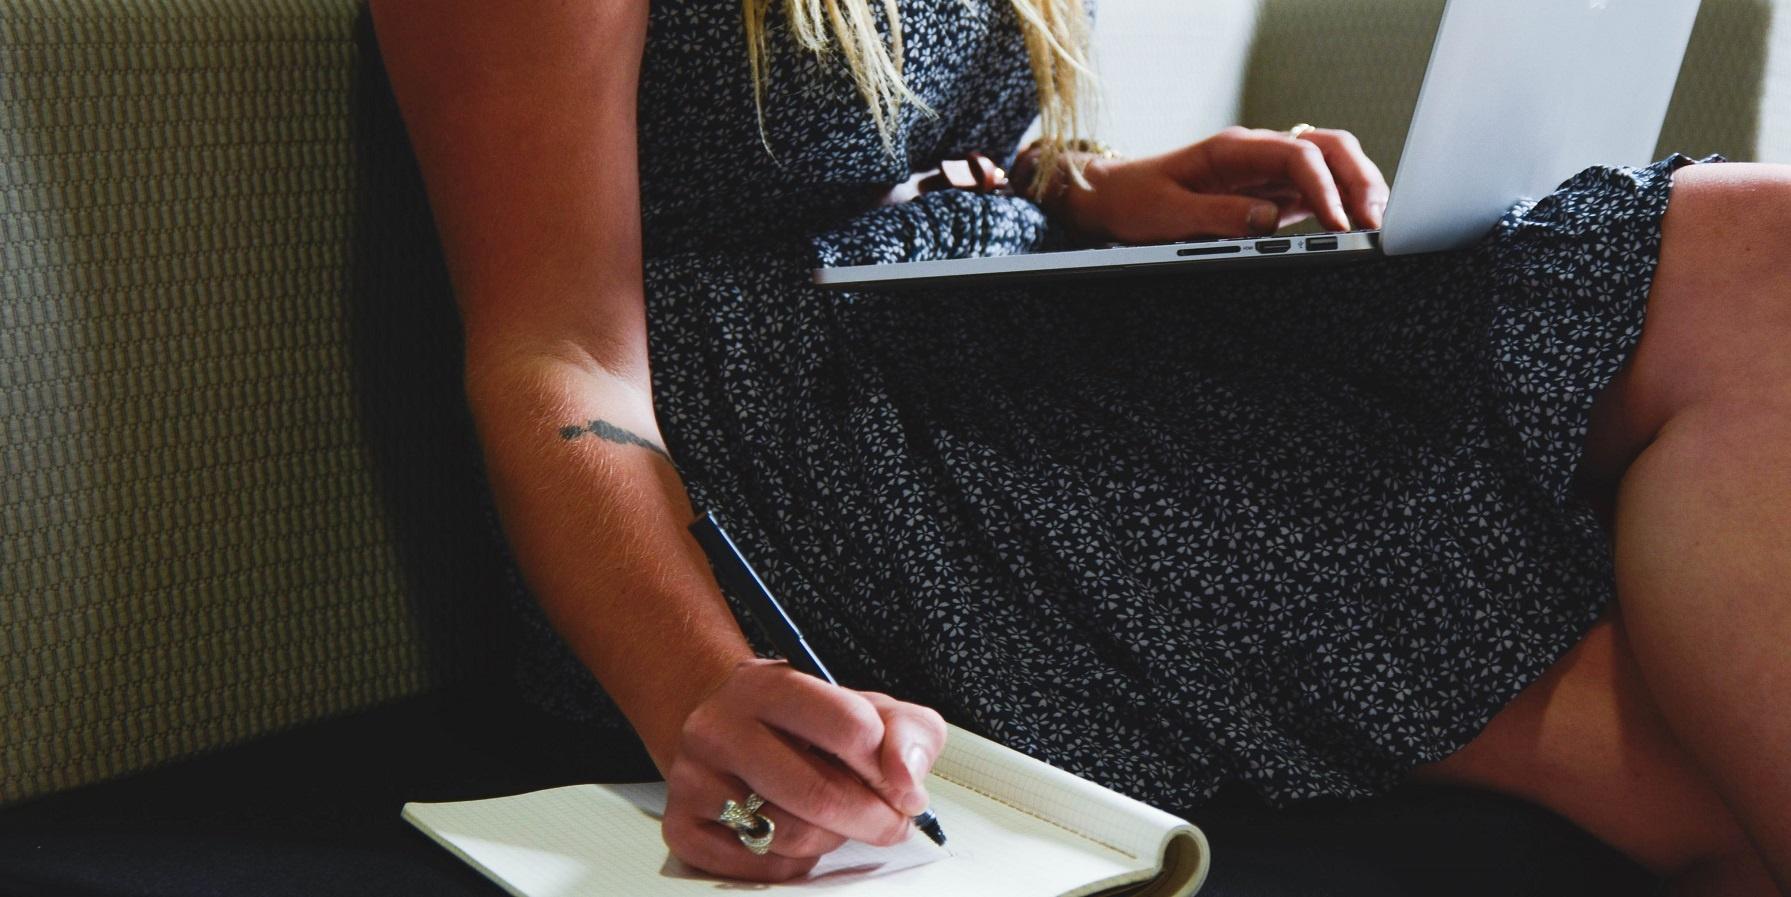 people-woman-girl-writing-smal.jpg